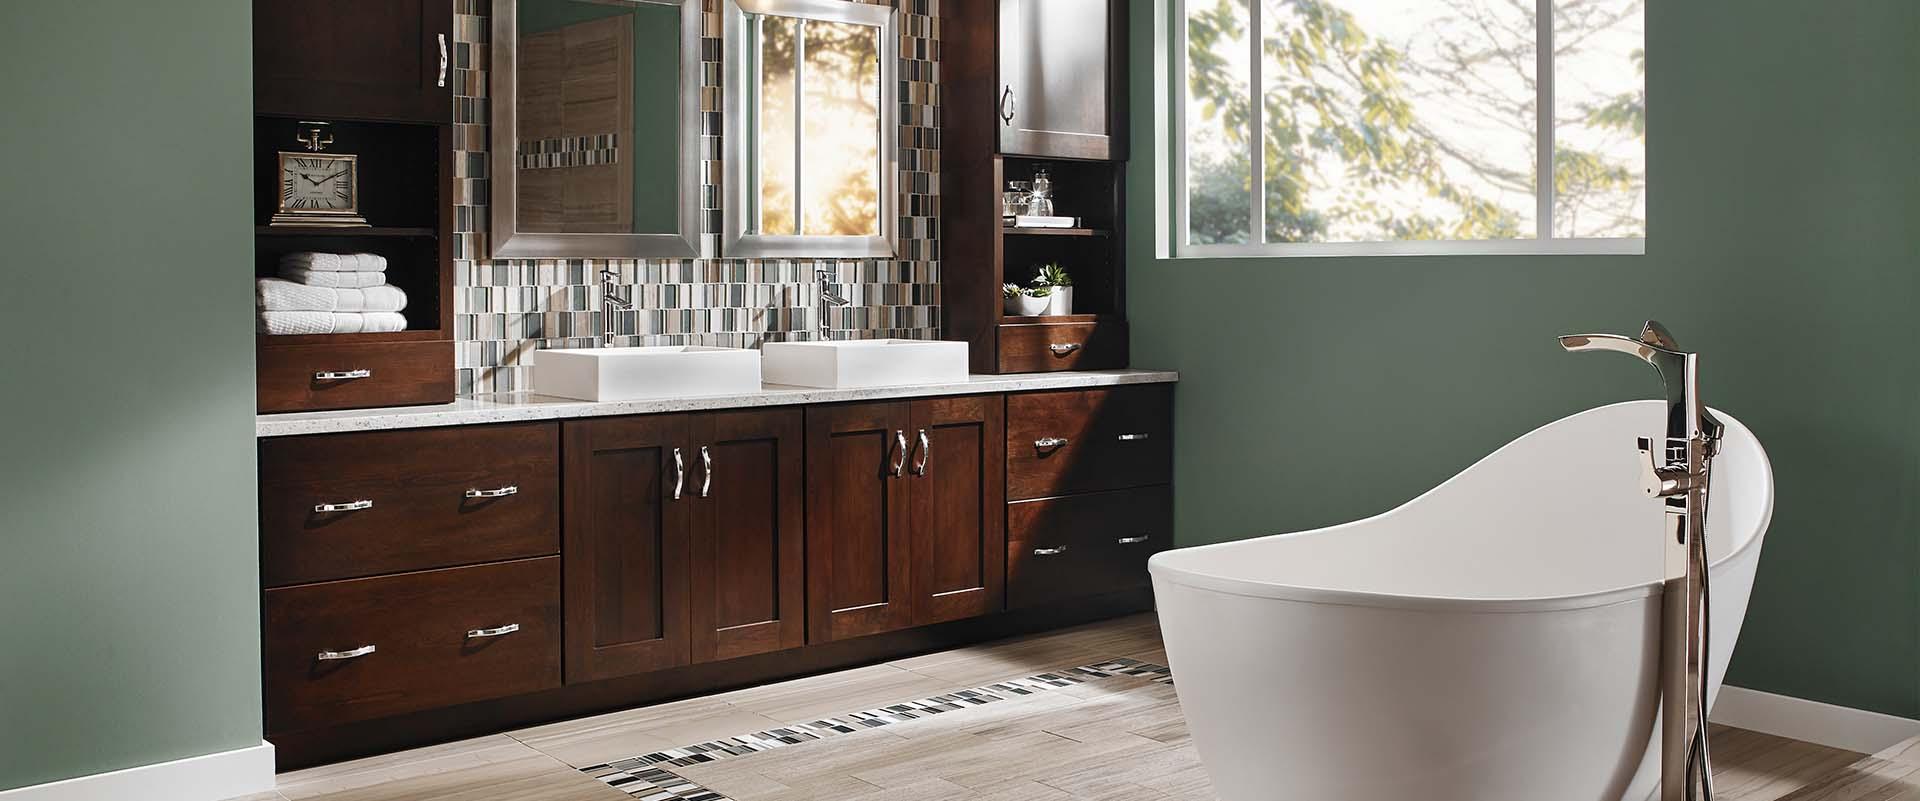 Marble Vs Quartz Countertops Critical Factors To Consider - Best countertops for bathrooms